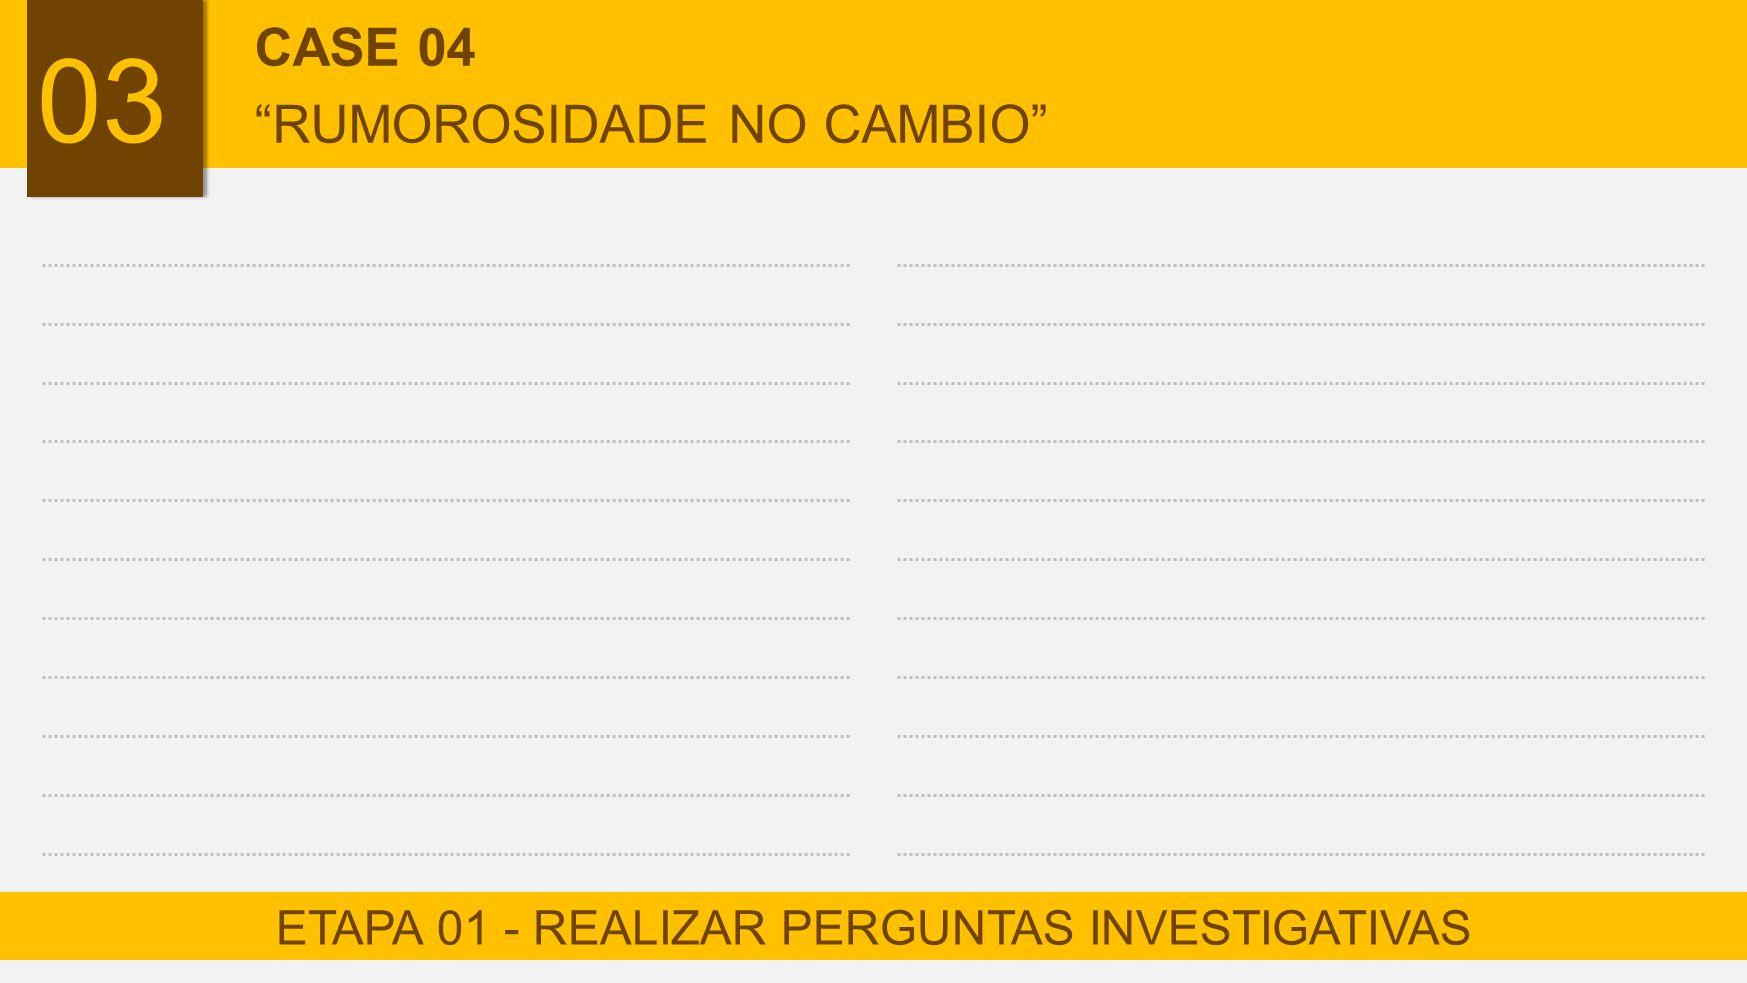 ETAPA 01 - REALIZAR PERGUNTAS INVESTIGATIVAS